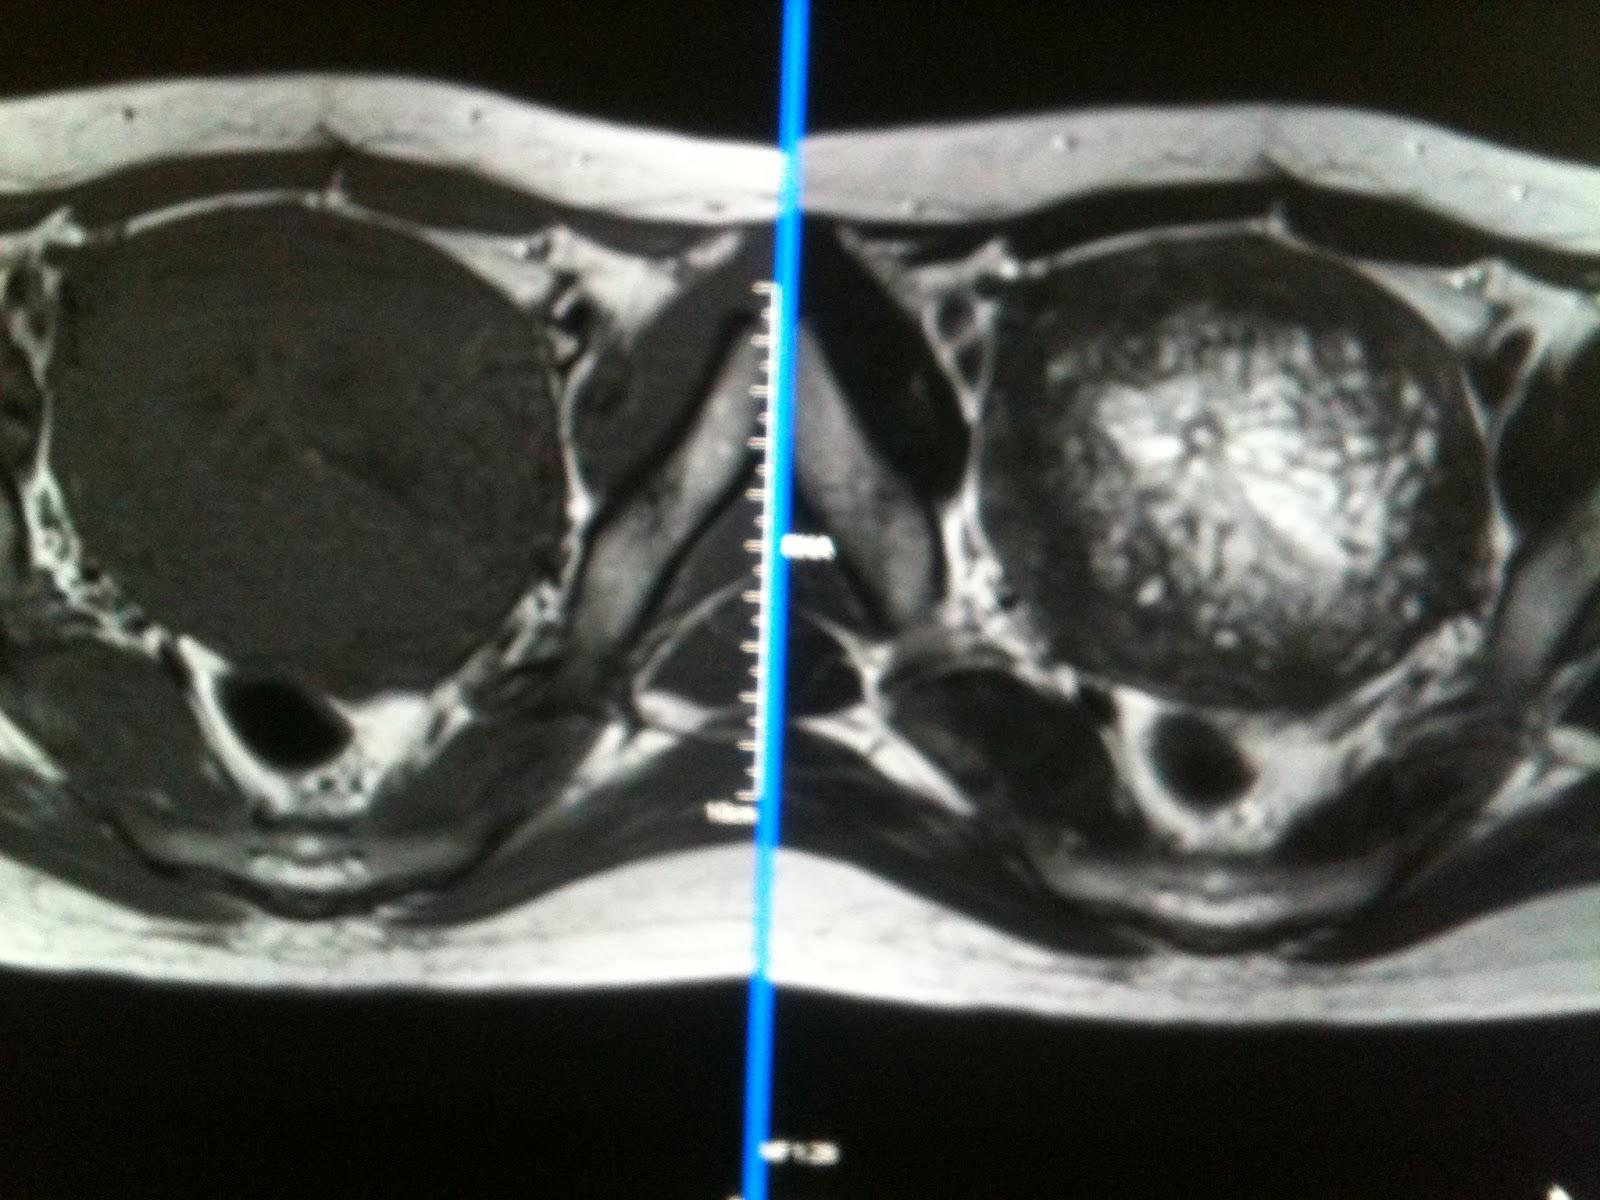 paraziți in corp cancer genital femei simptome